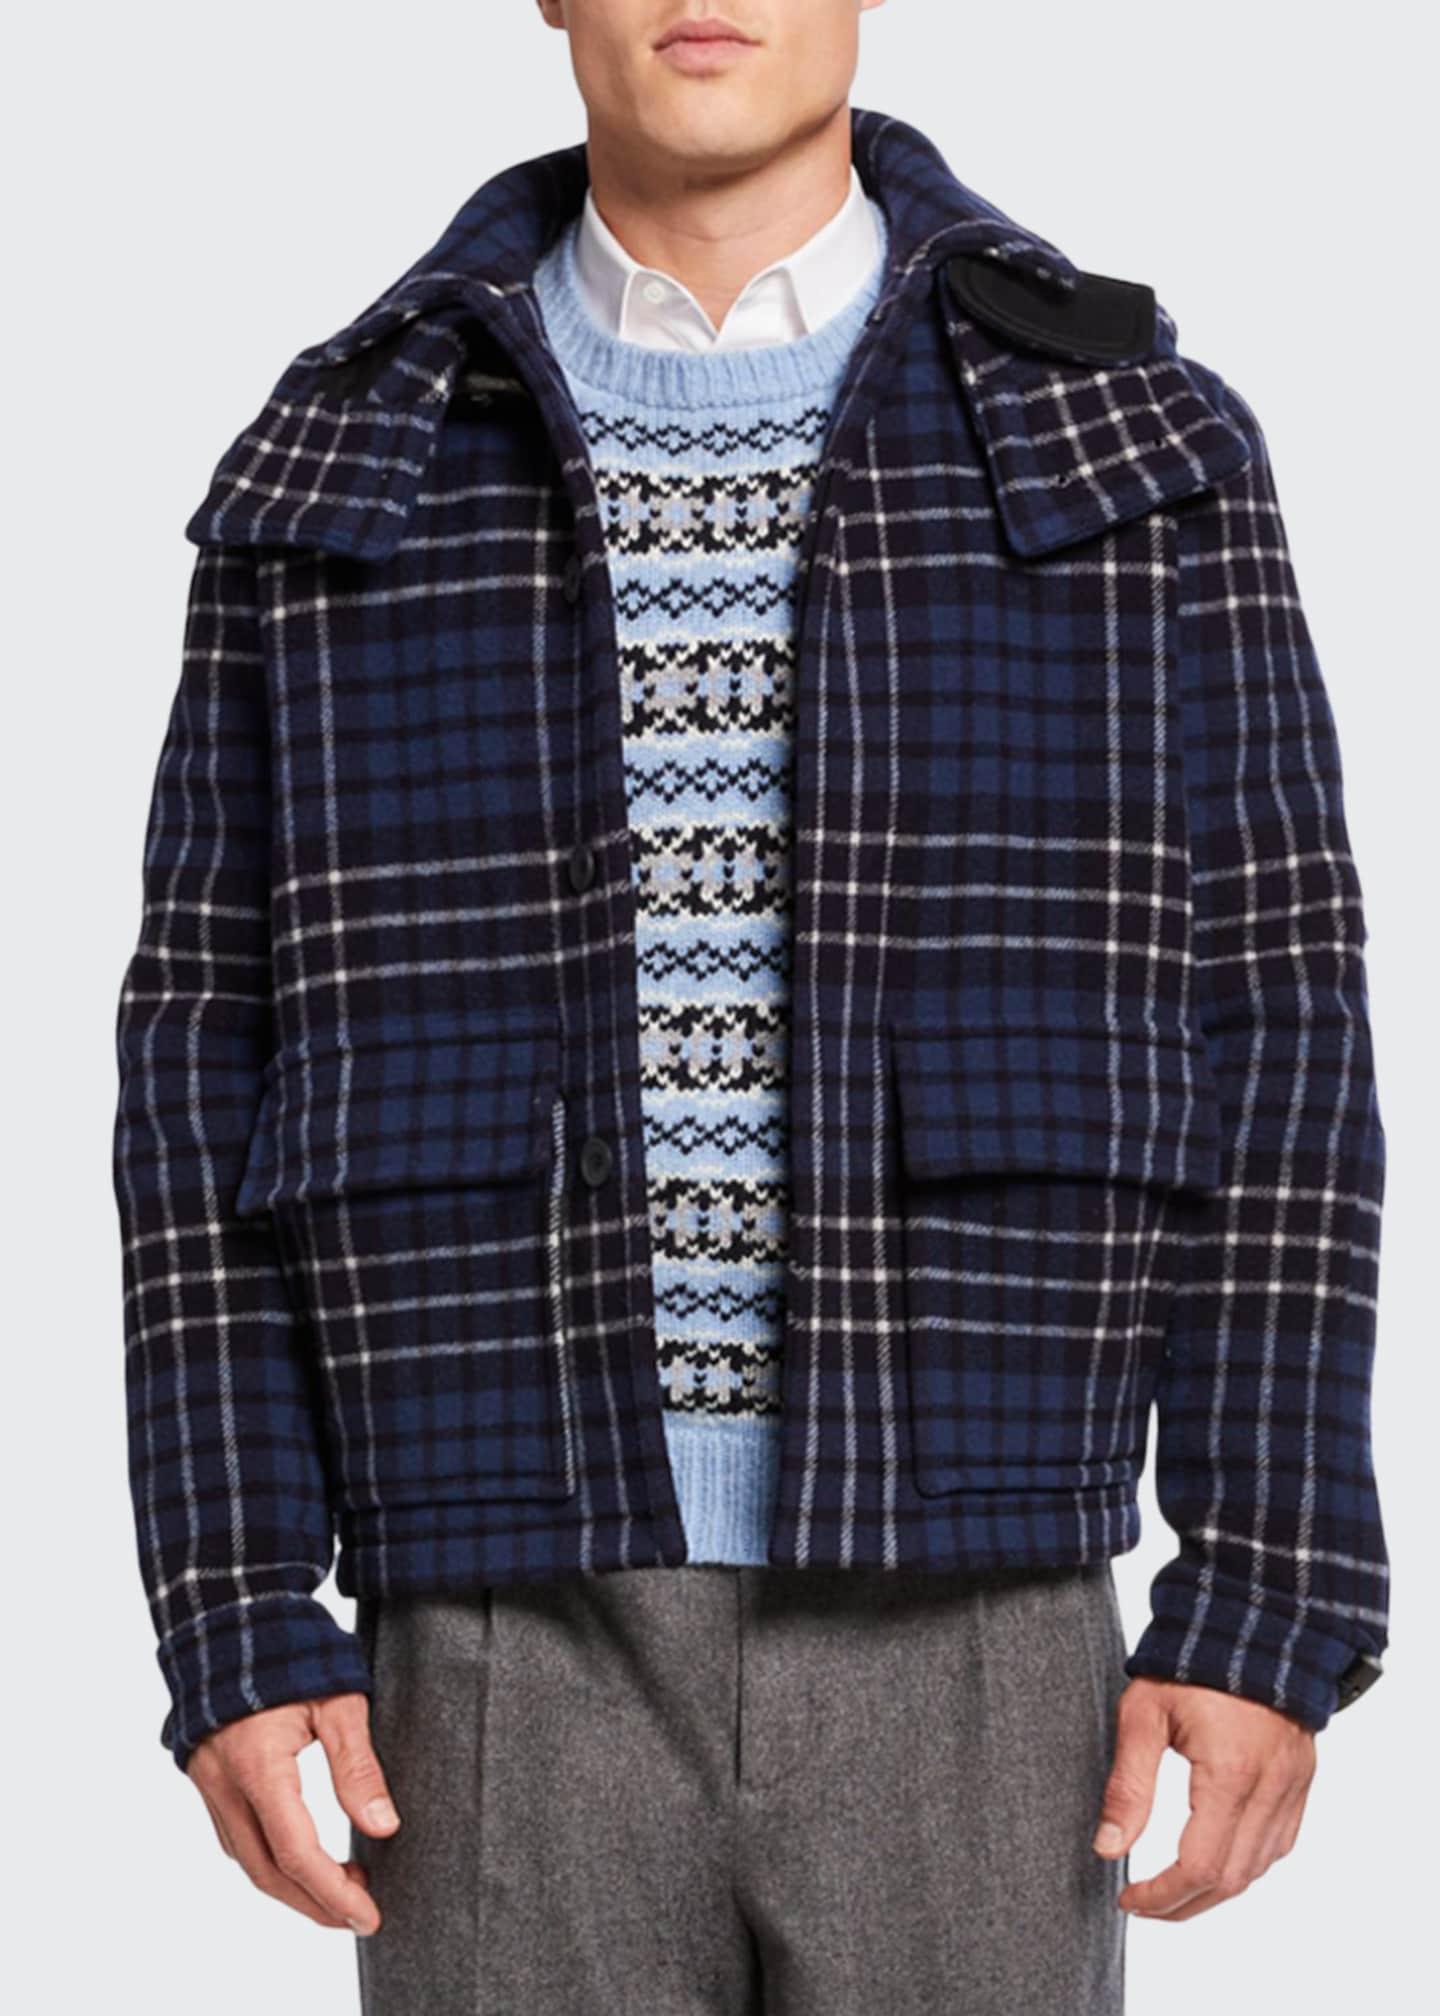 Lou Dalton Men's x Gloverall Wool Melton Utility